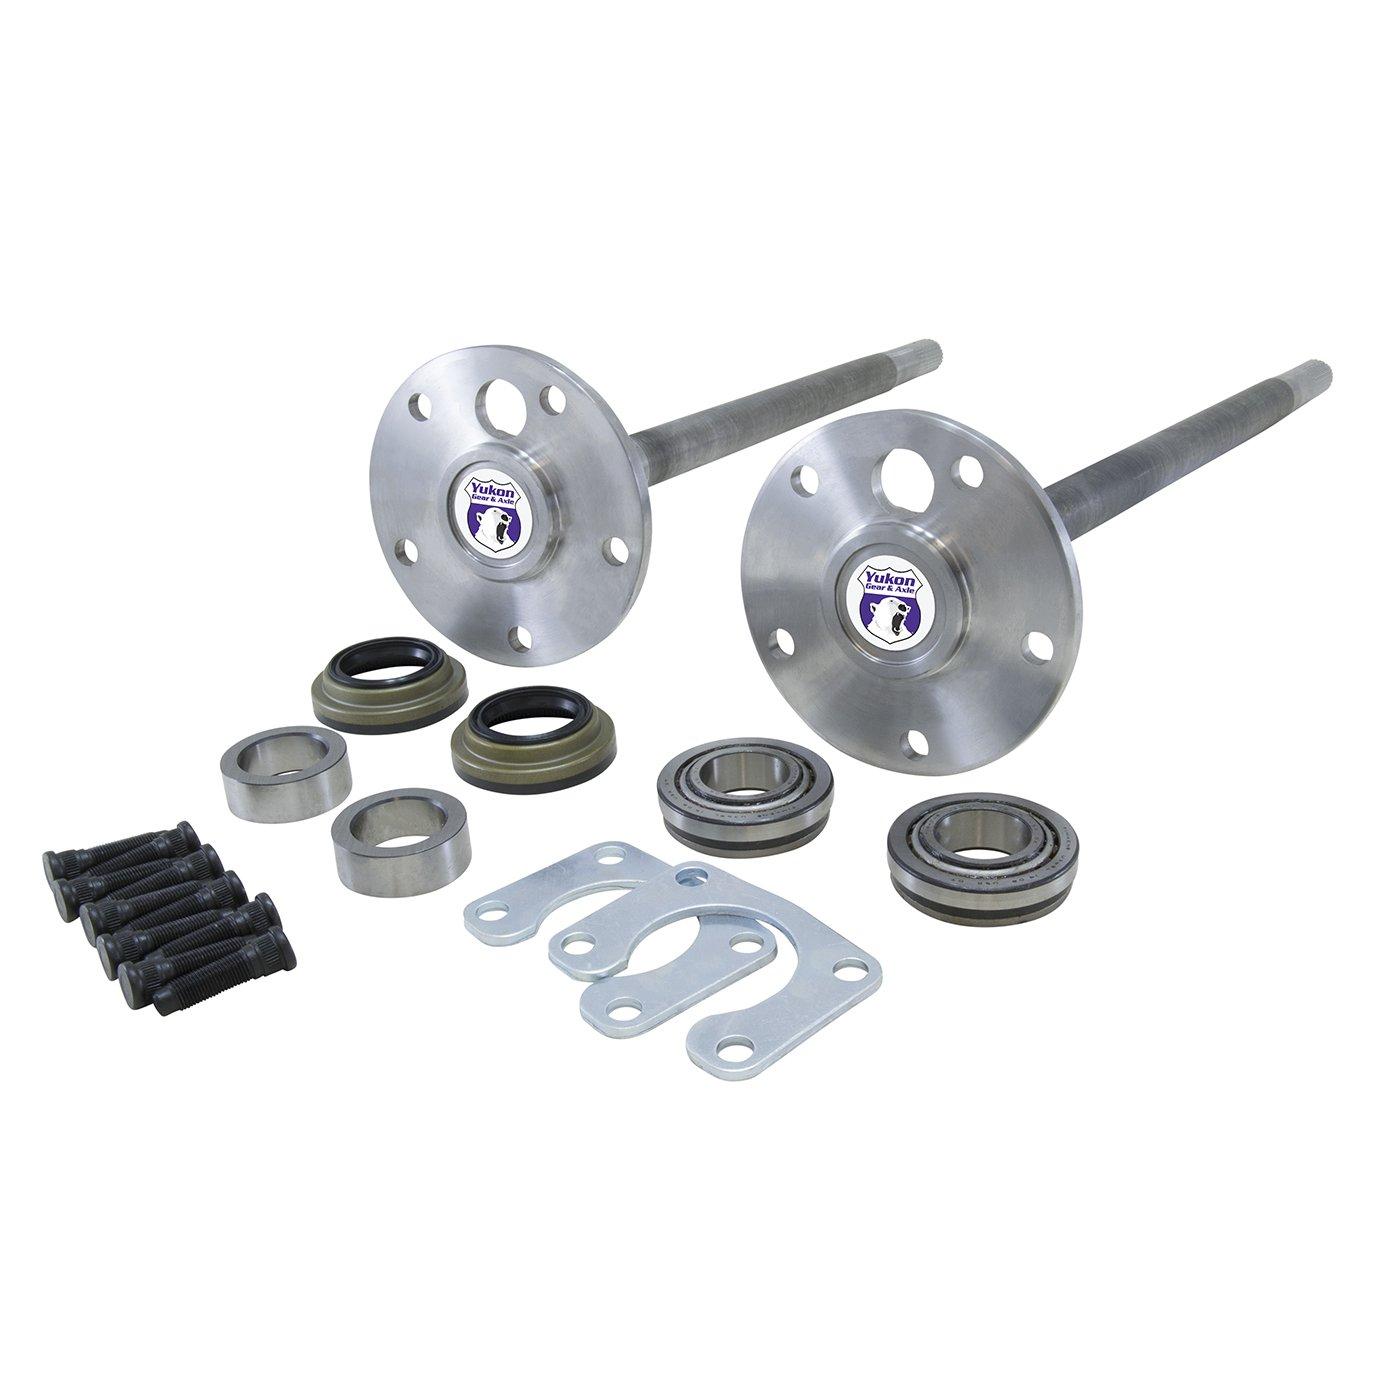 Replacement Axle Kit for Jeep XJ//TJ//YJ Dana 30 Front Differential 4340 Chrome-Moly YA W24110 Yukon Gear /& Axle